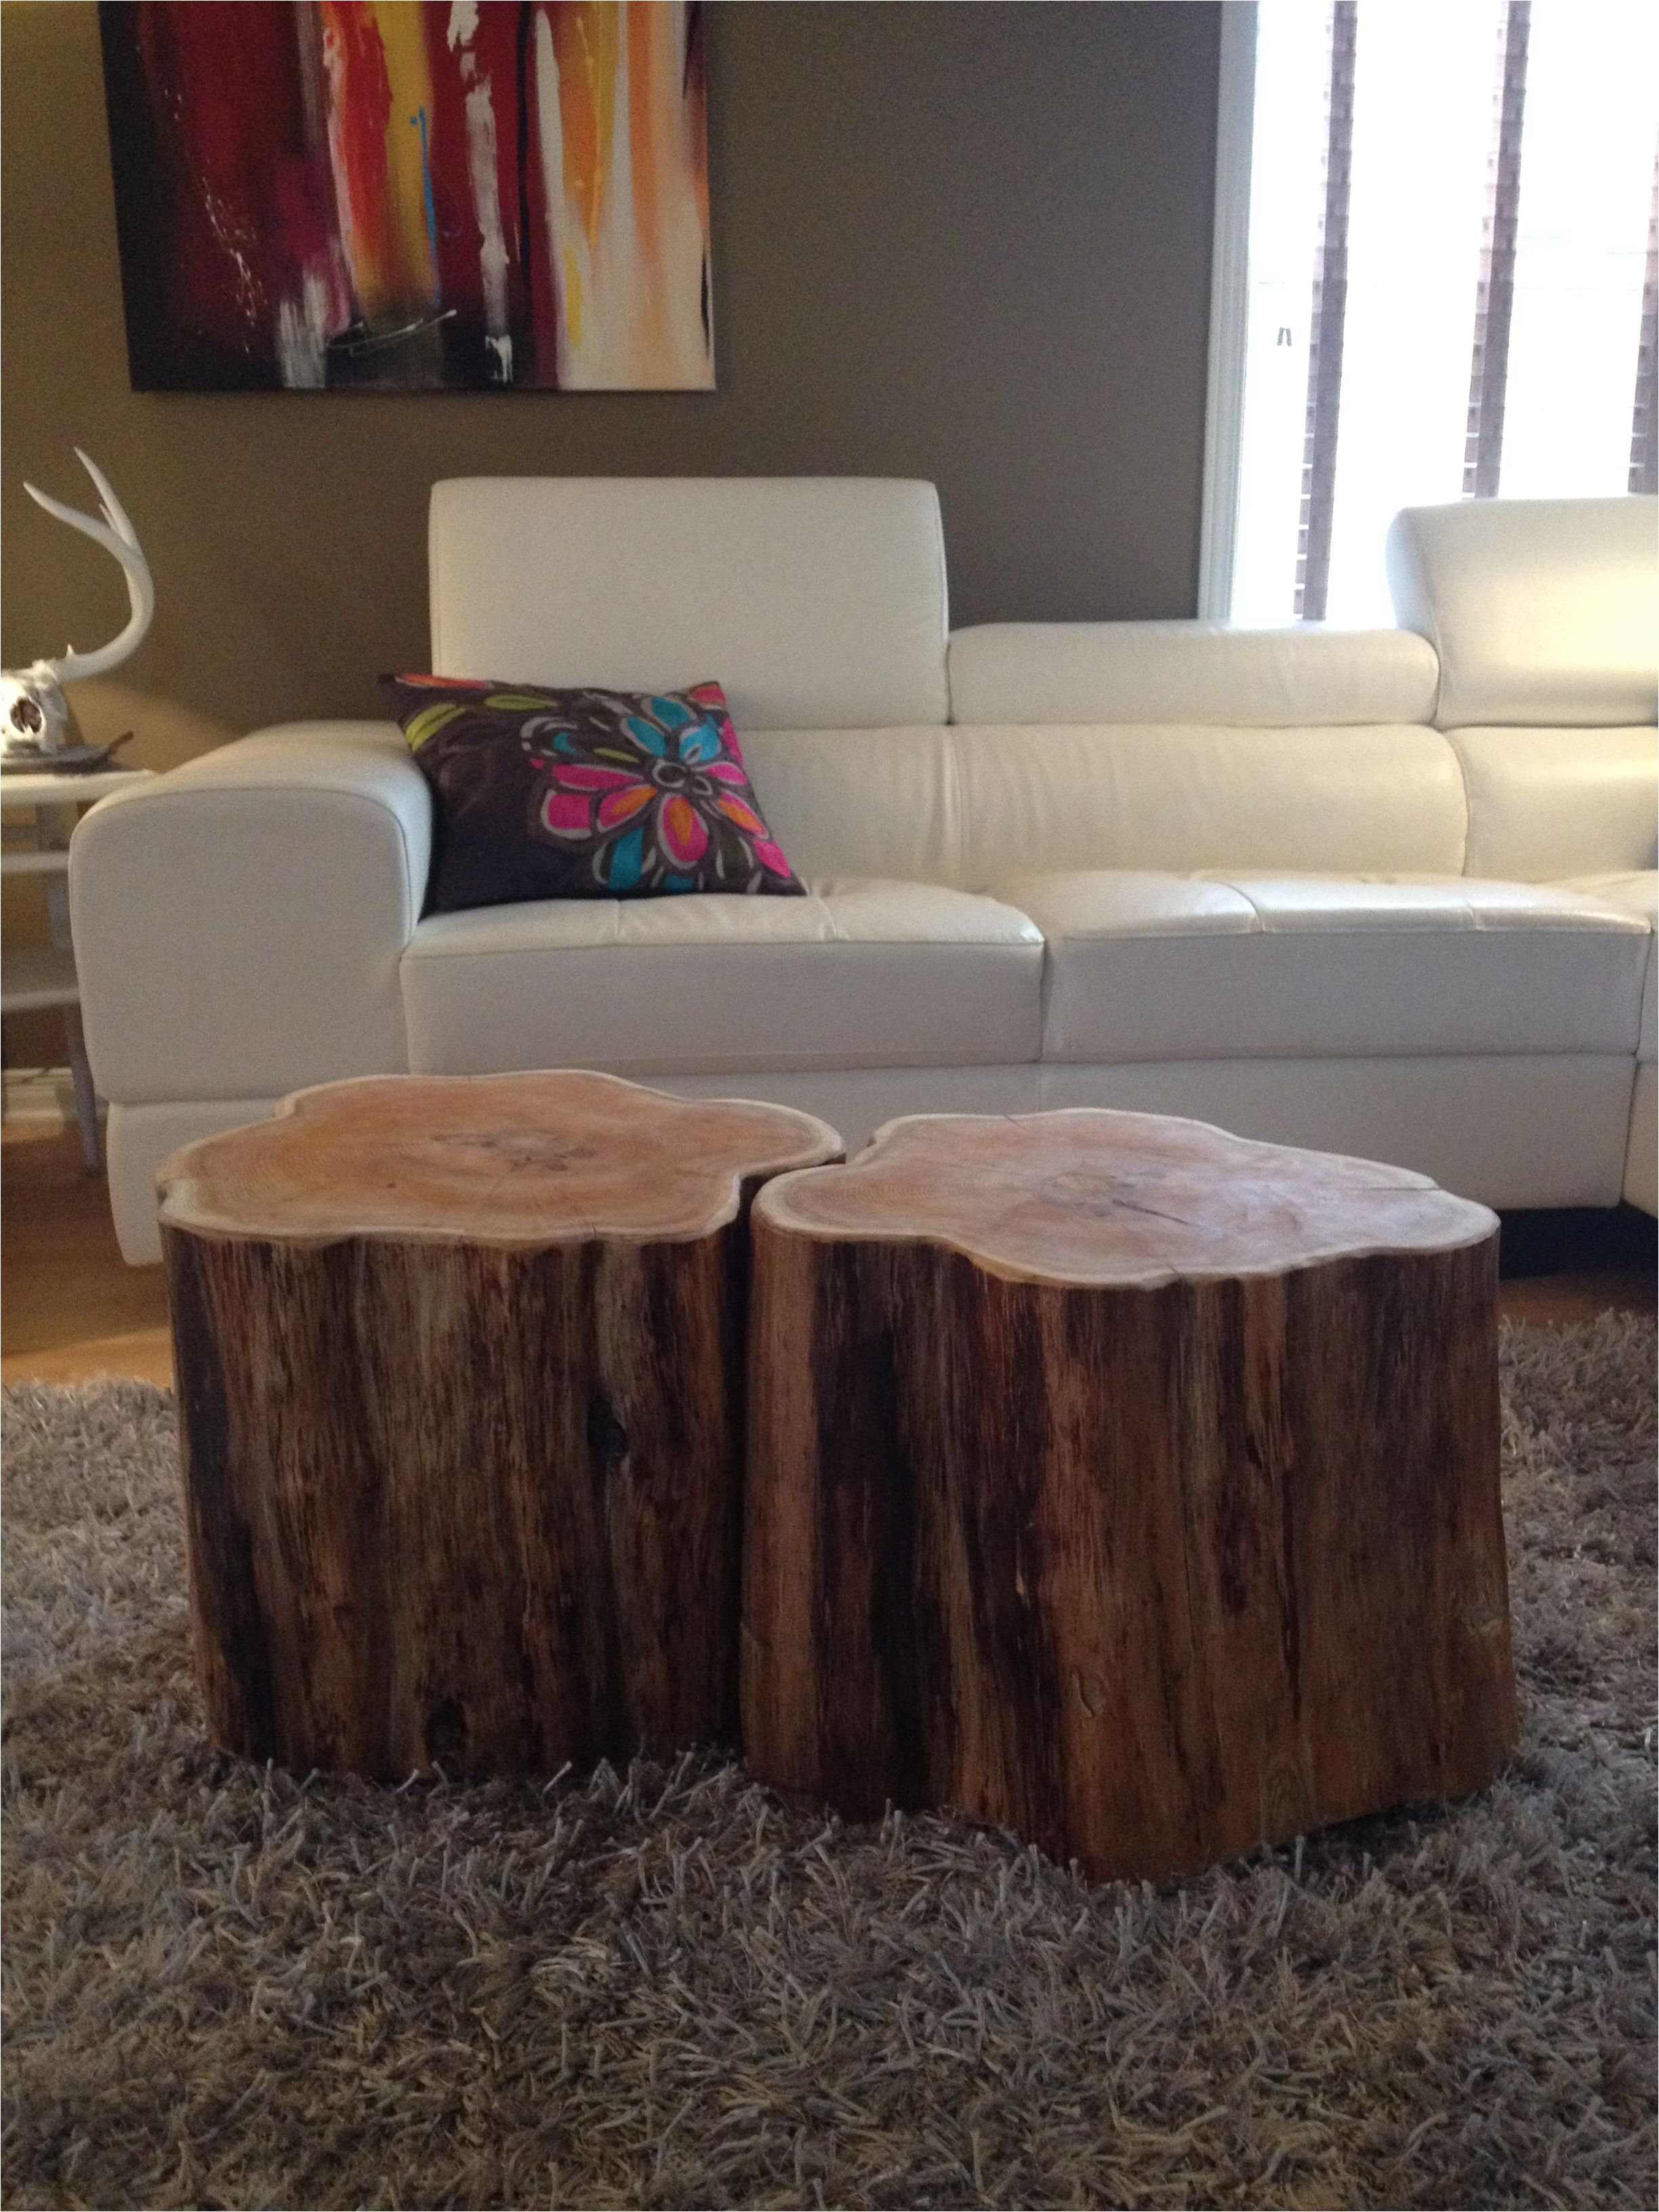 stump coffee tables serenitystumps com tree trunk tables stump coffee table like ellen ottawa ontario canada sump coffee table like ellen show tree trunk